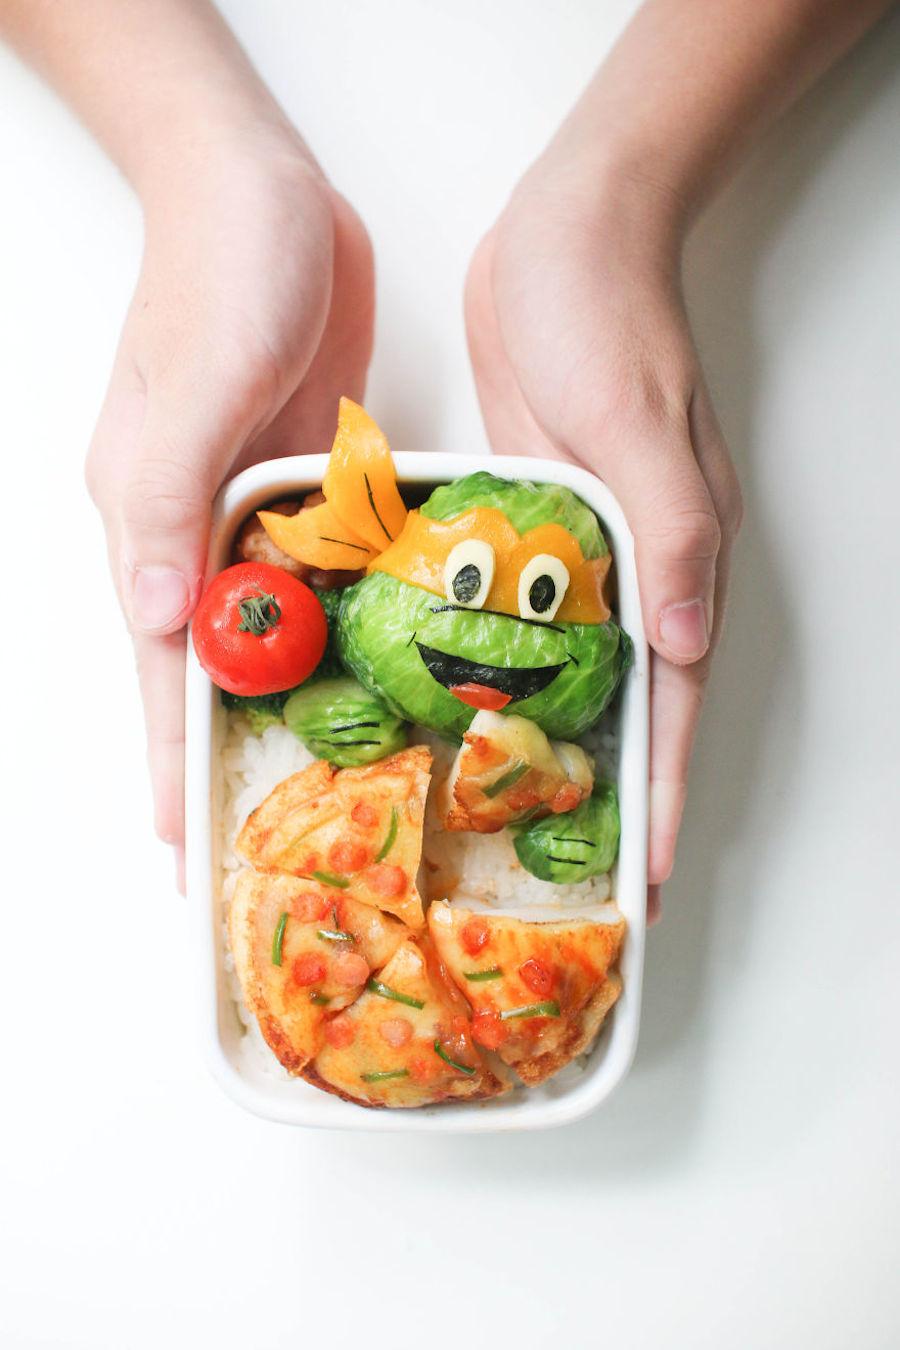 bento-cibo-pasto-decorazioni-bambini-cartoni-bentomonsters-19